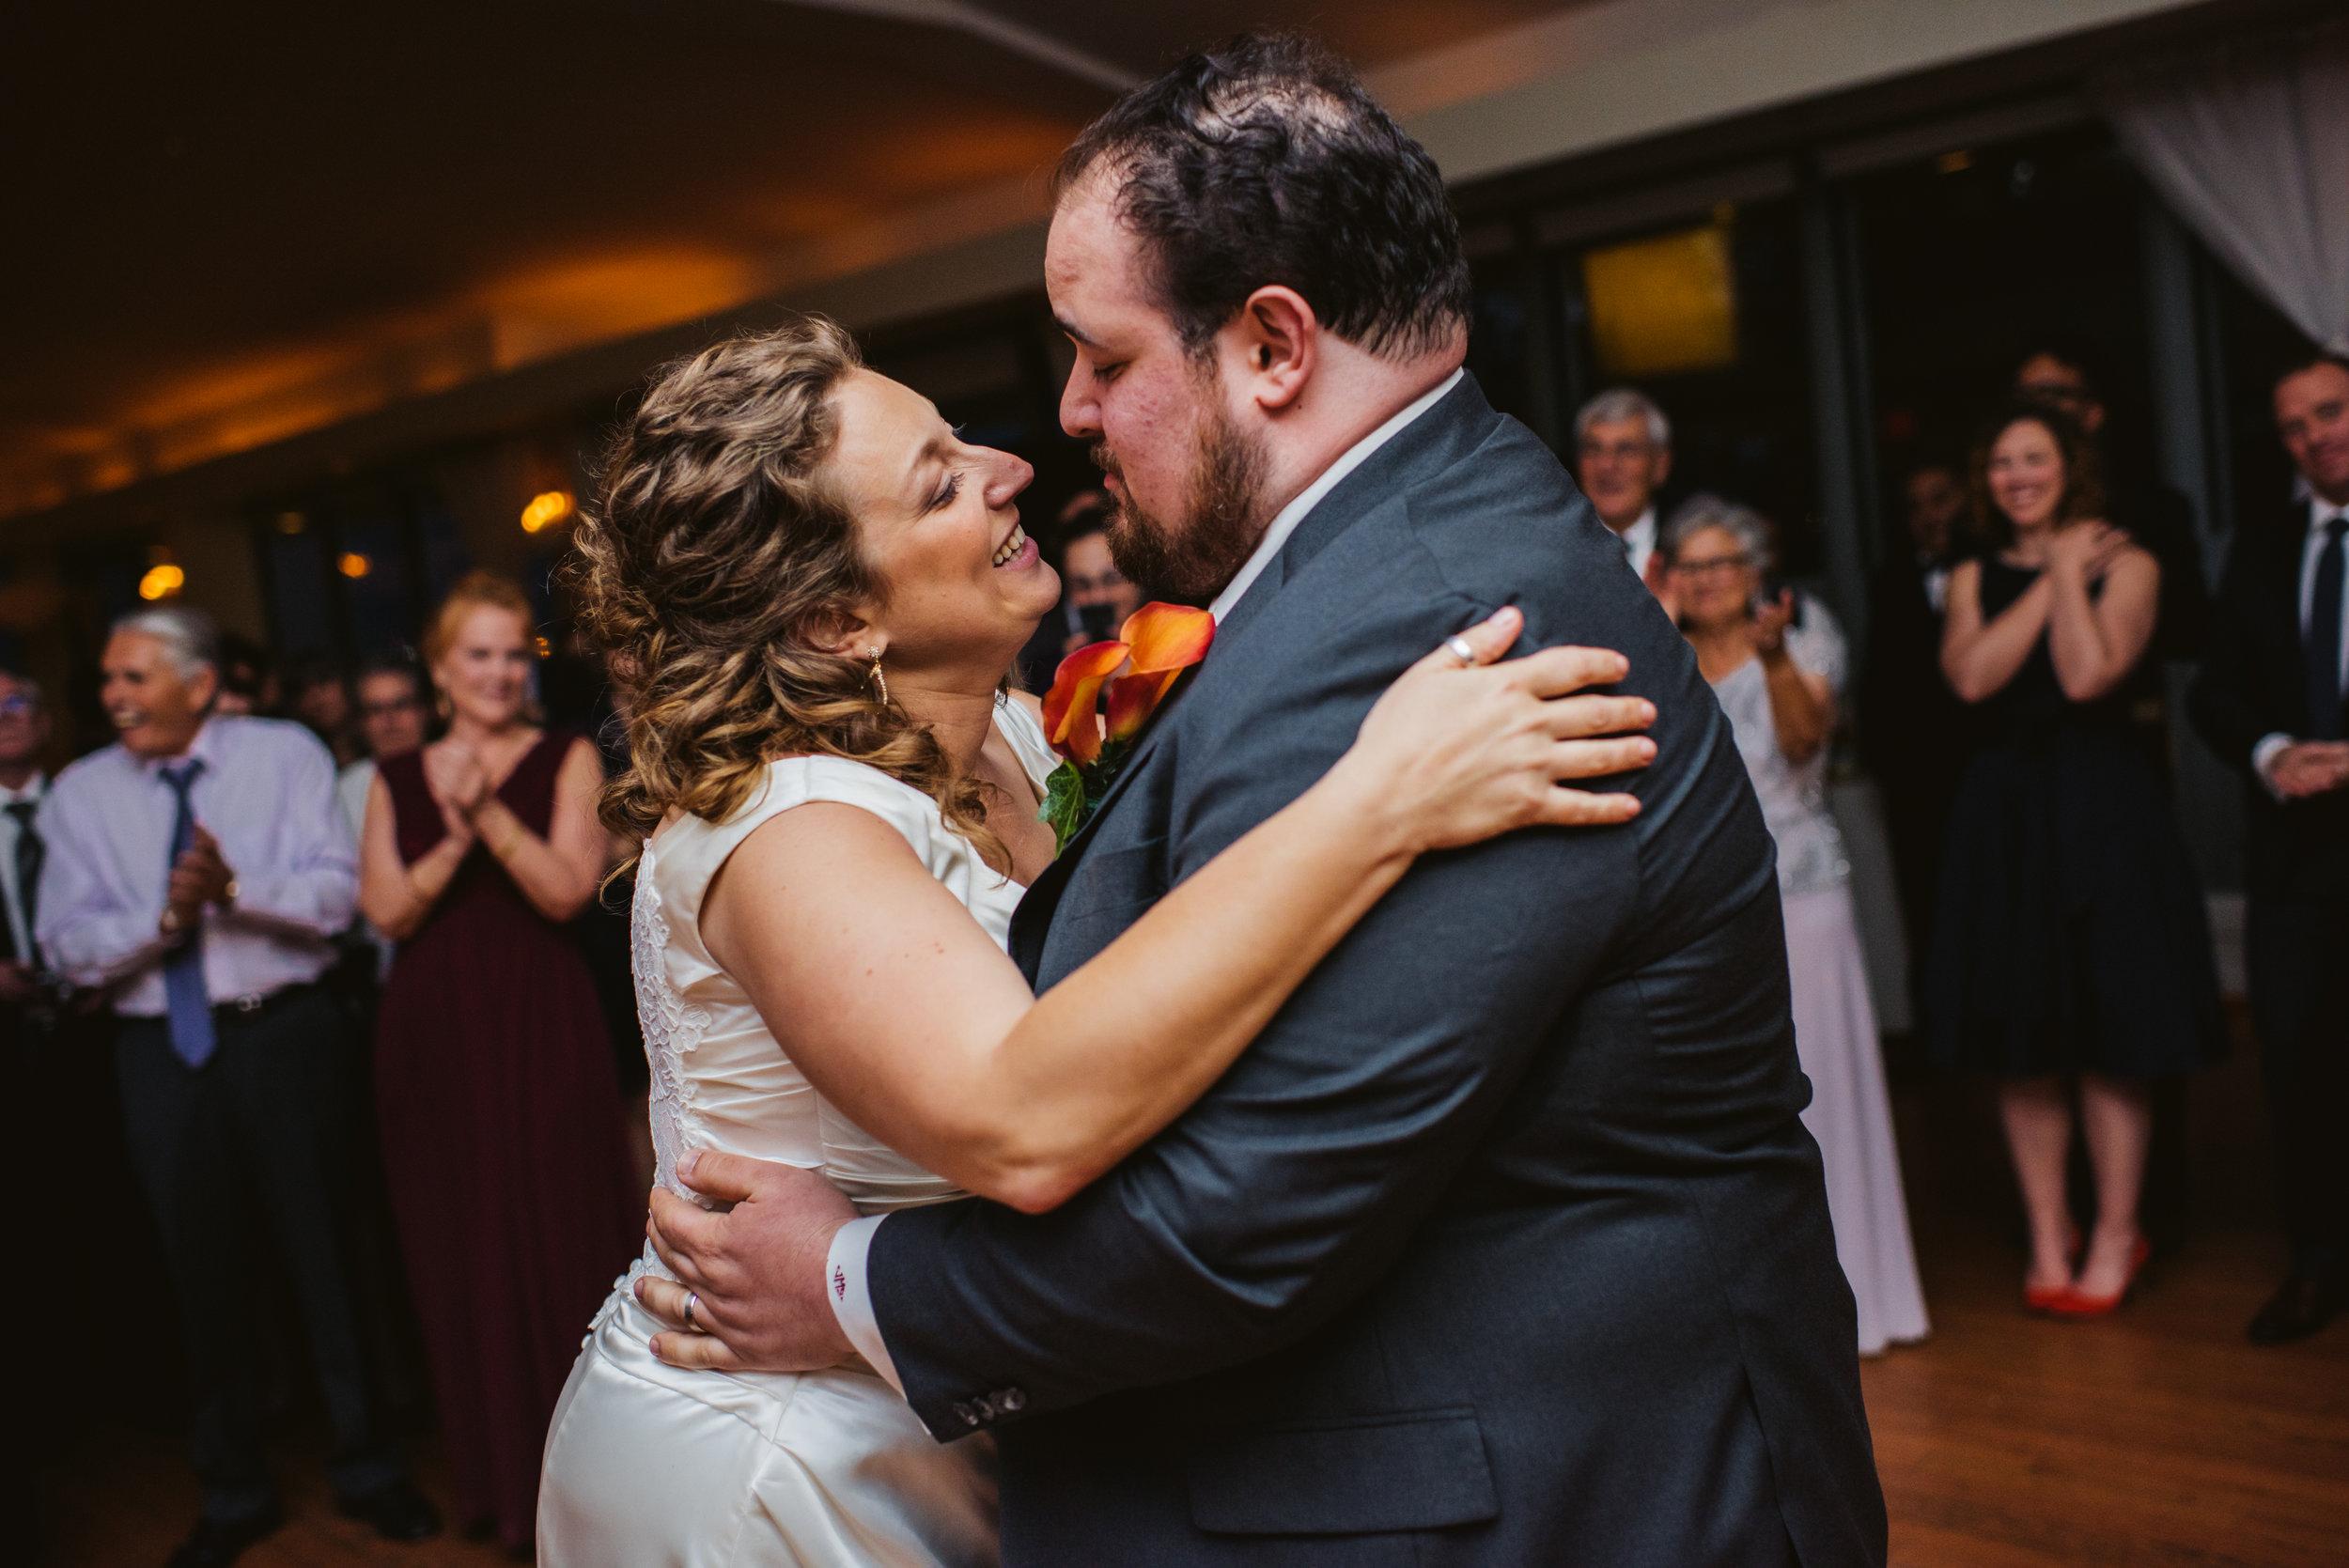 LIZA & JON - BATTERY PARK WEDDING - NYC INTIMATE WEDDING PHOTOGRAPHER - CHI-CHI AGBIM-680.jpg